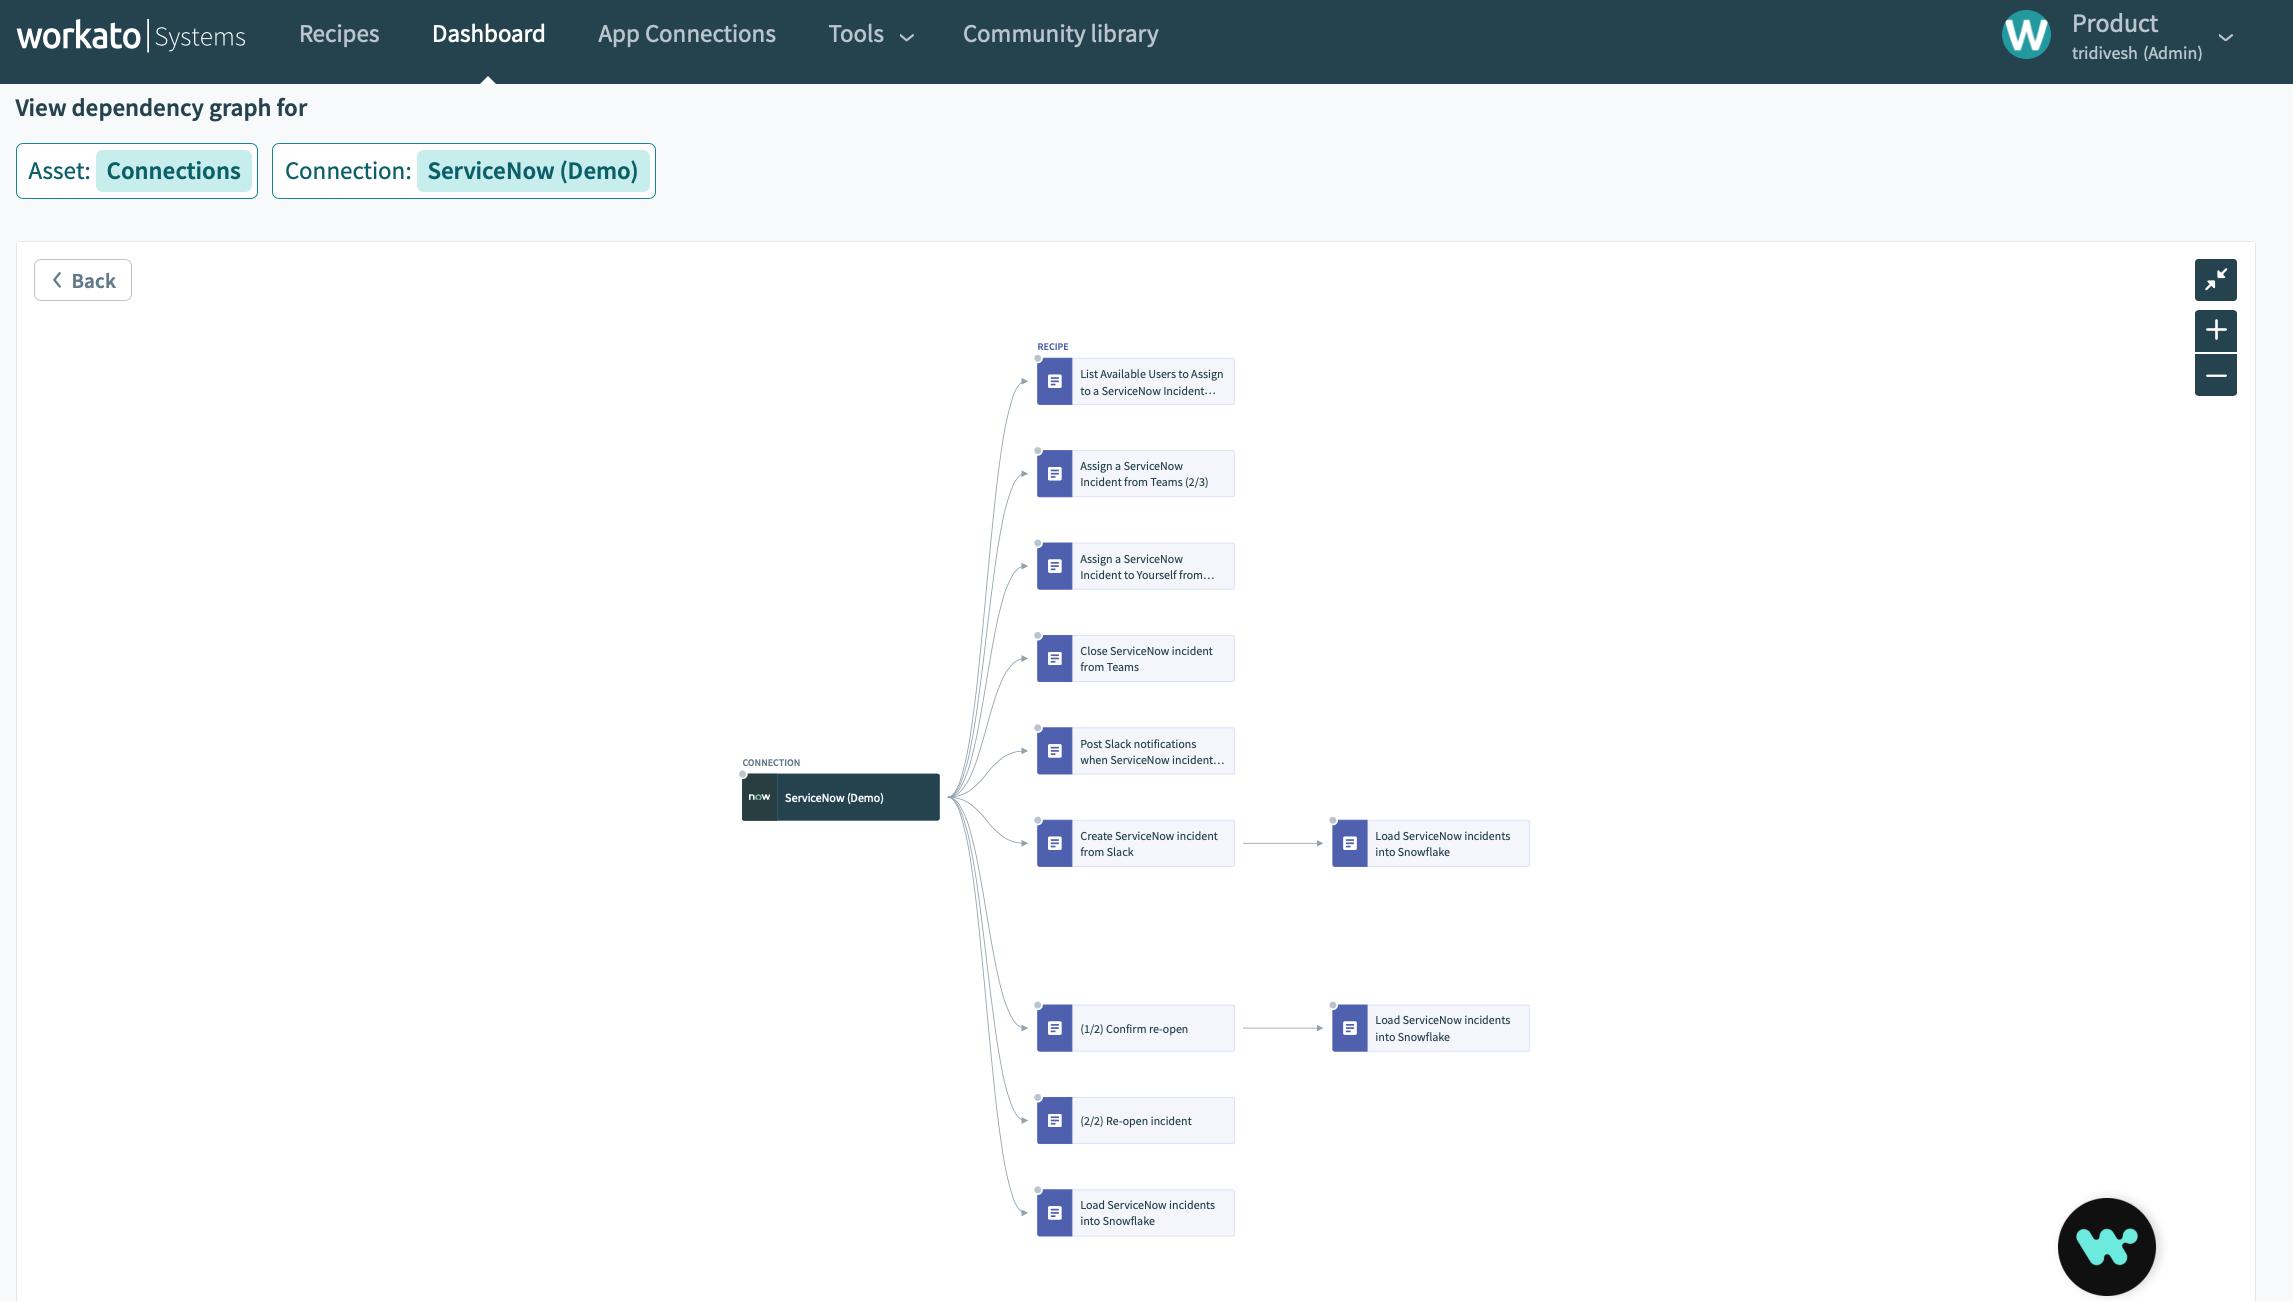 Visualize dependencies to analyze impact